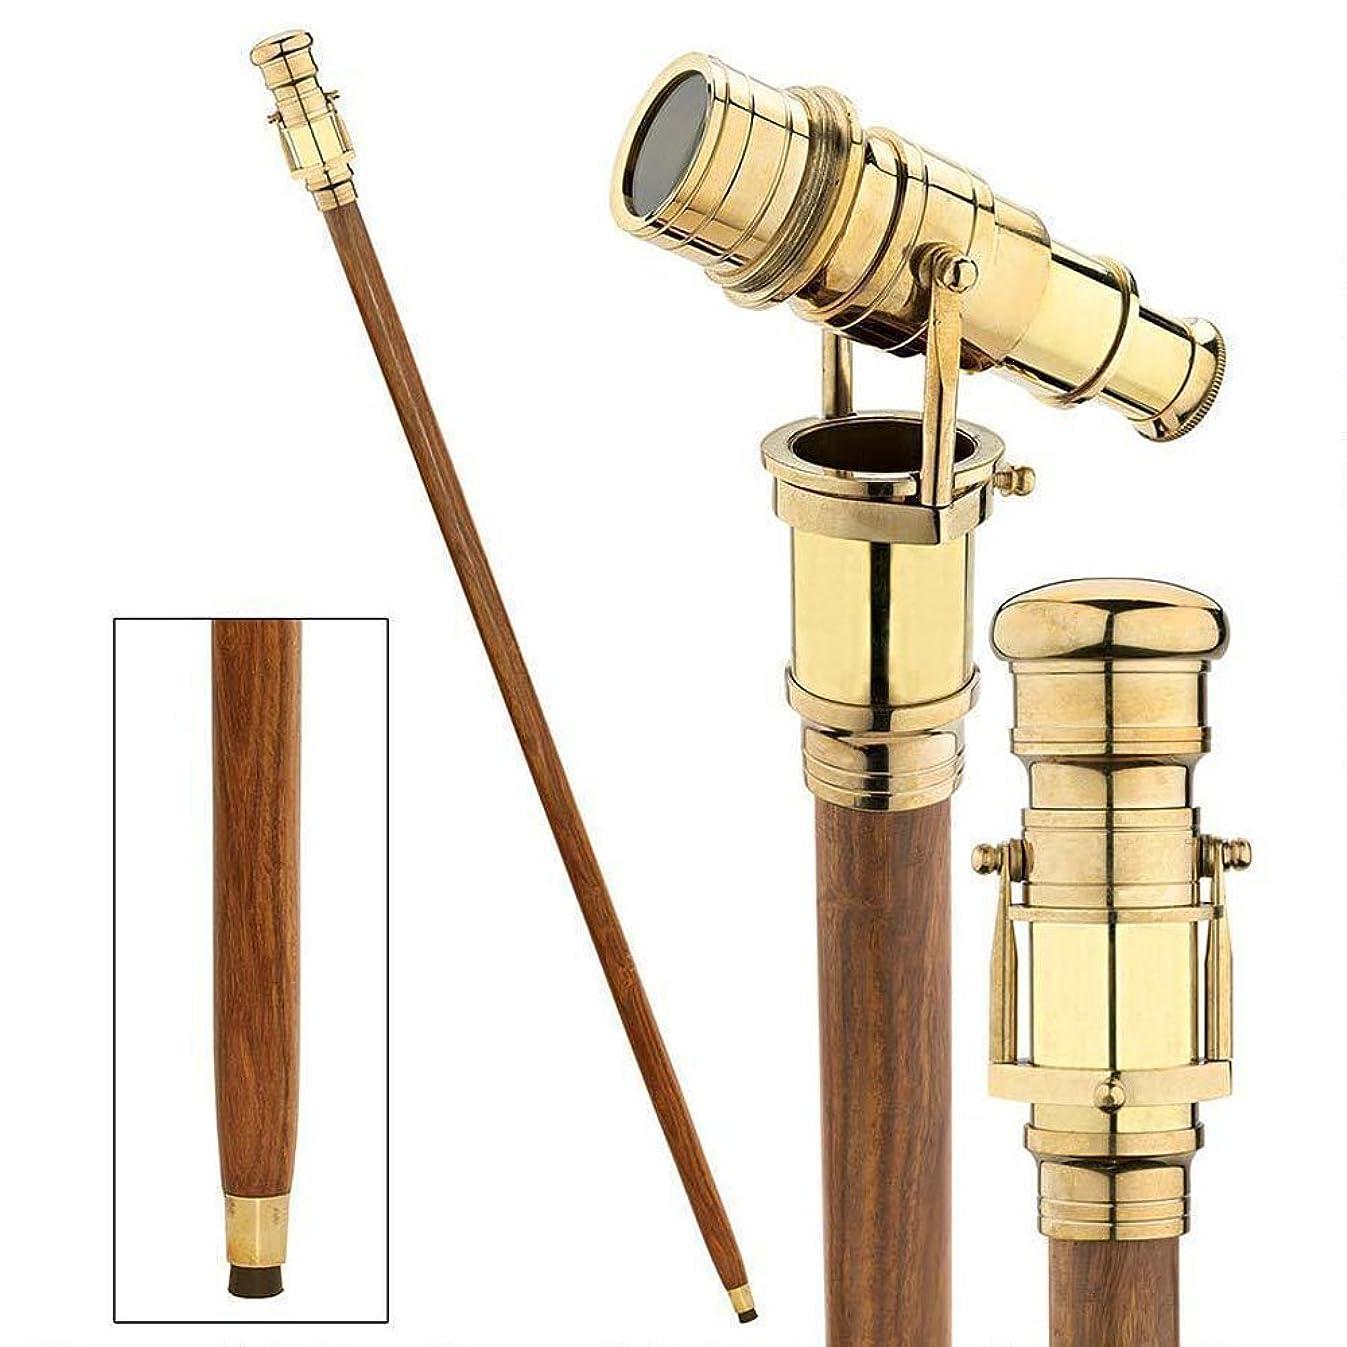 Sun & Moon Vintage Brass Handle Victorian Telescope Head Foldable Wooden Walking Stick Cane (Brass Finish)